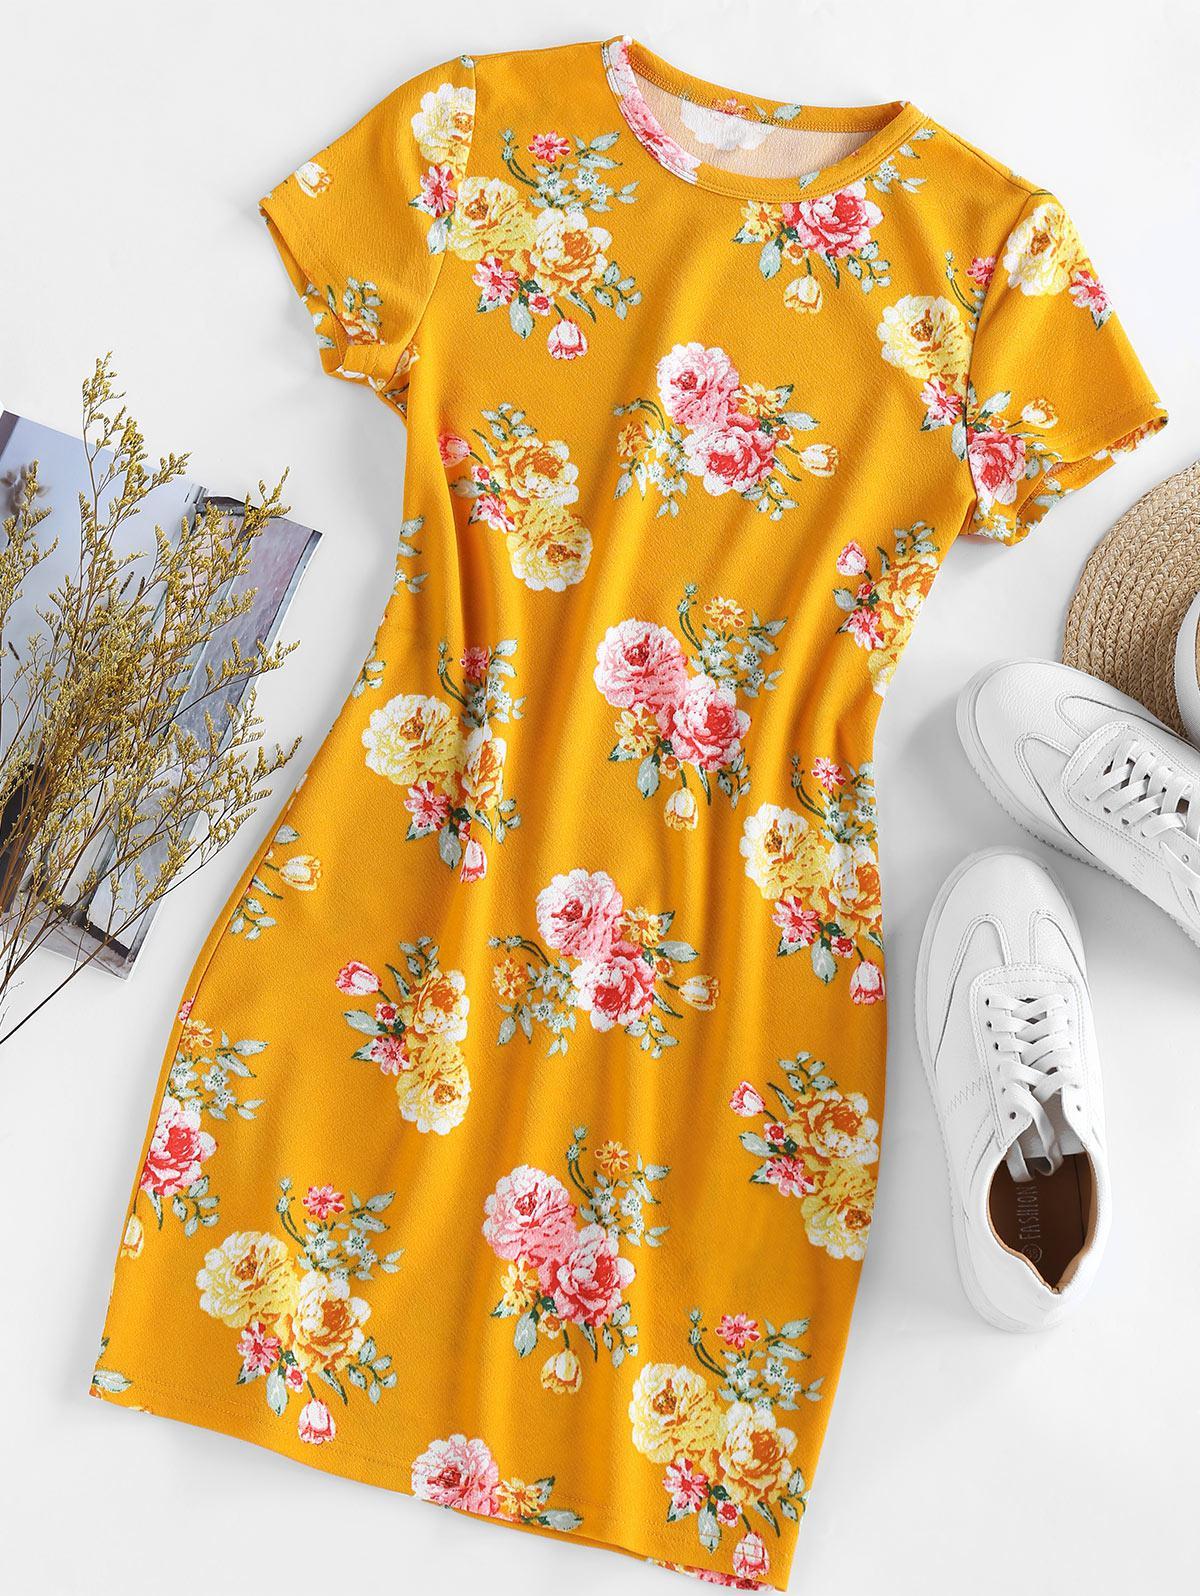 ZAFUL Sports Floral Printed Dress